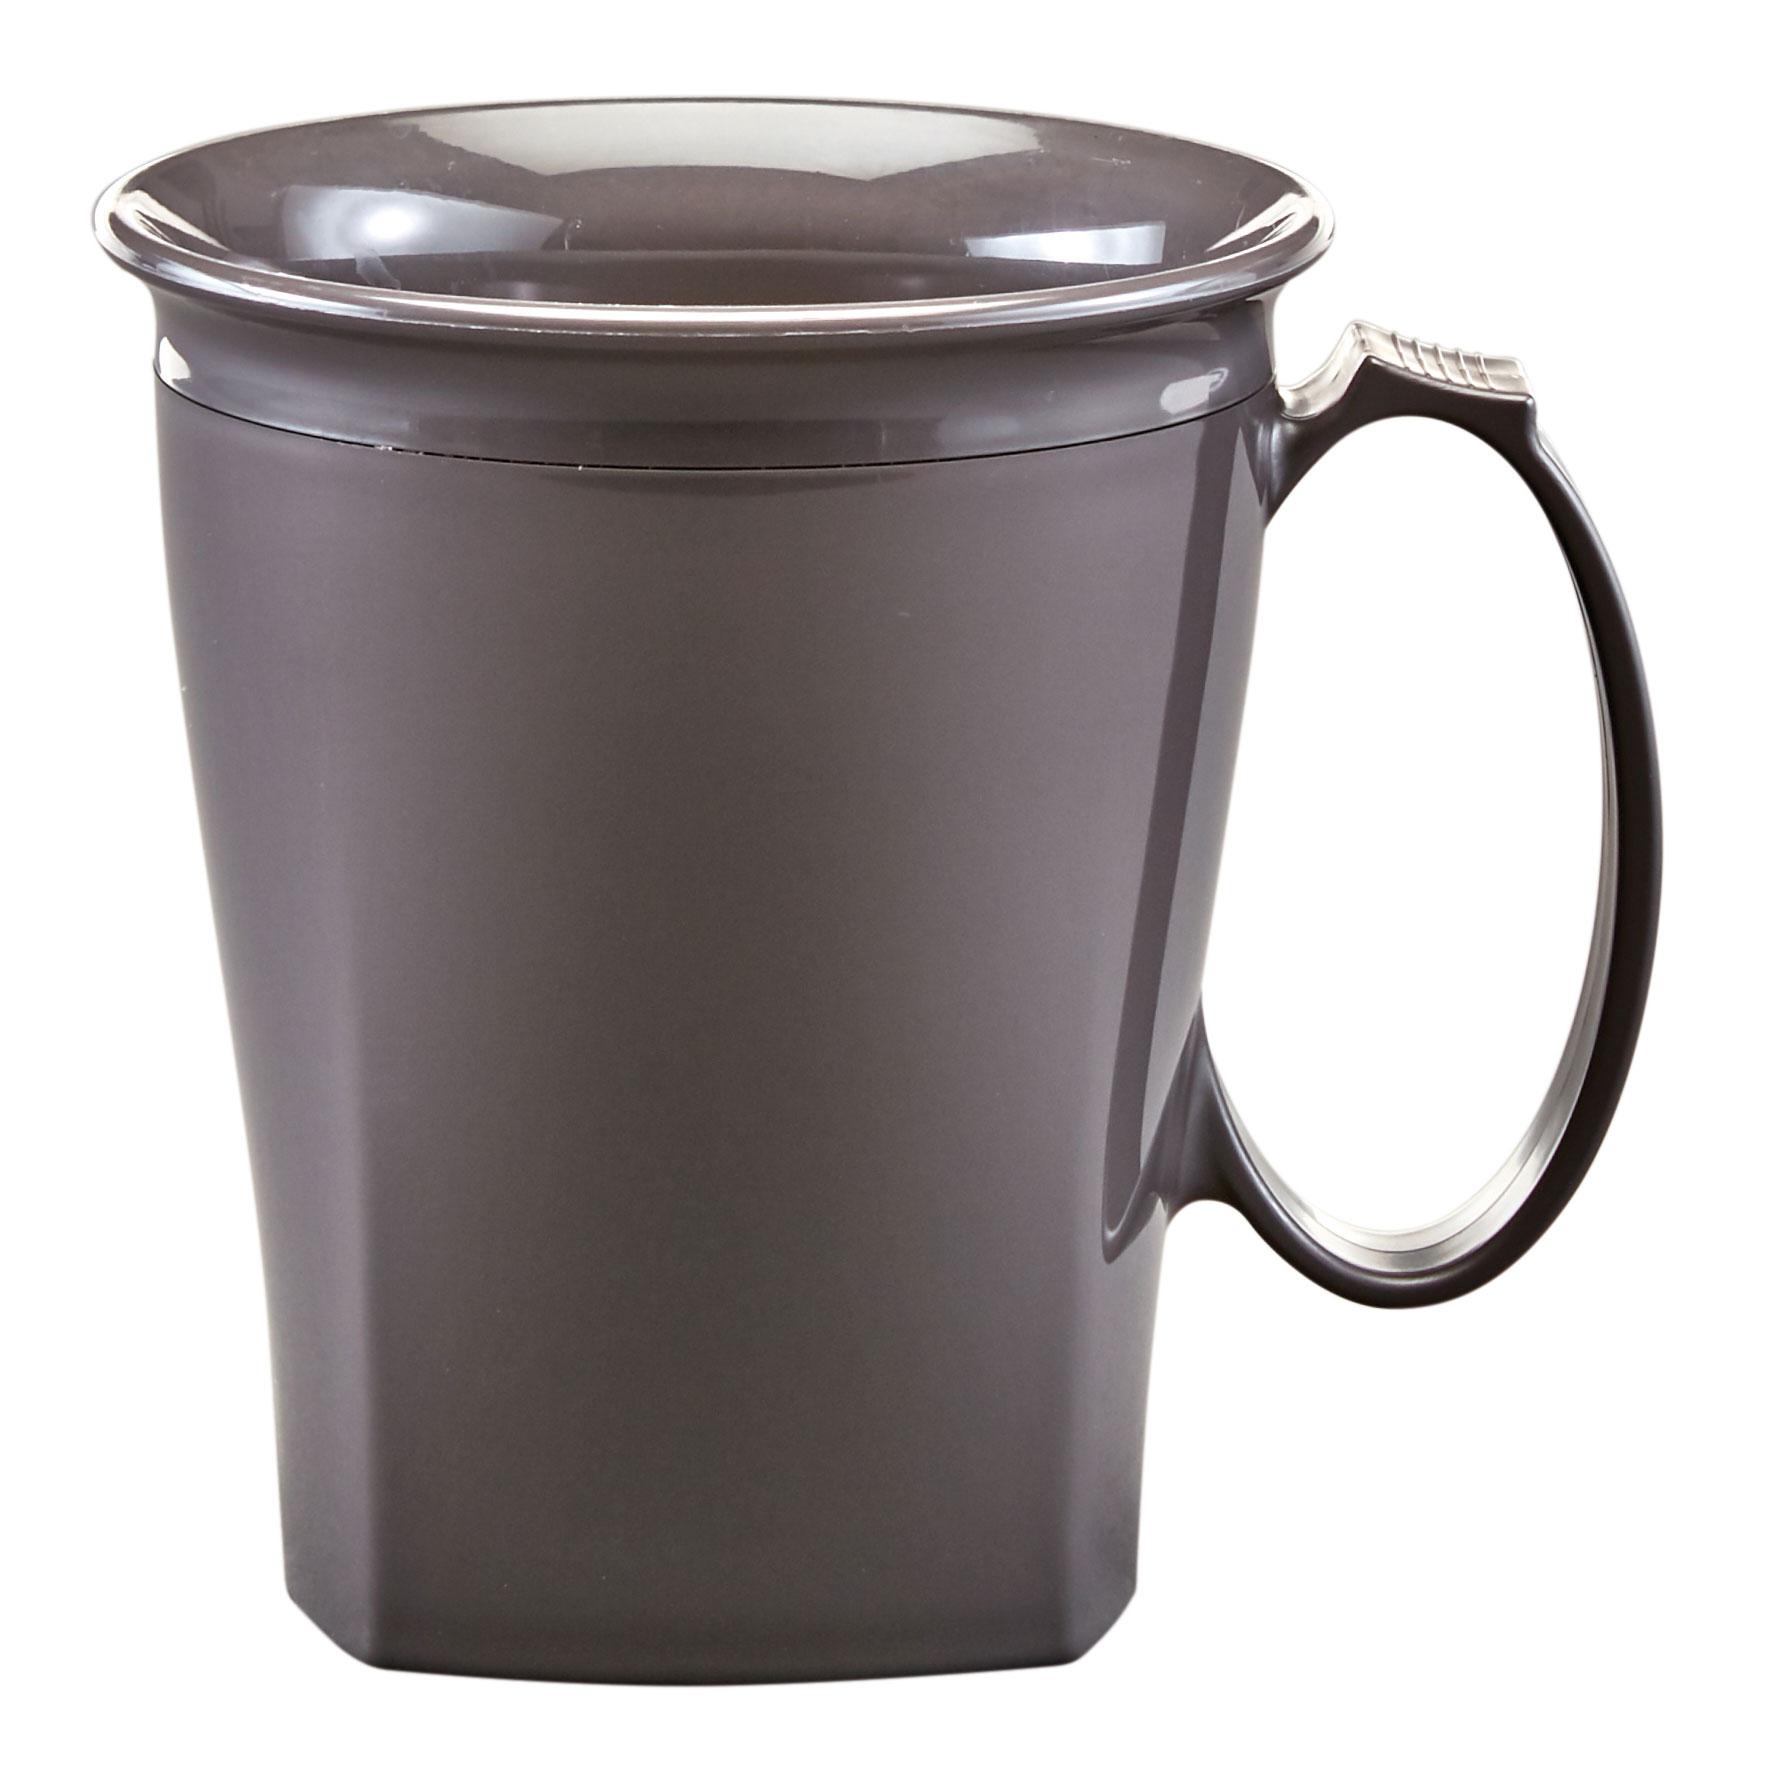 Cambro MDSHM8485 mugs/cups (non disposable)